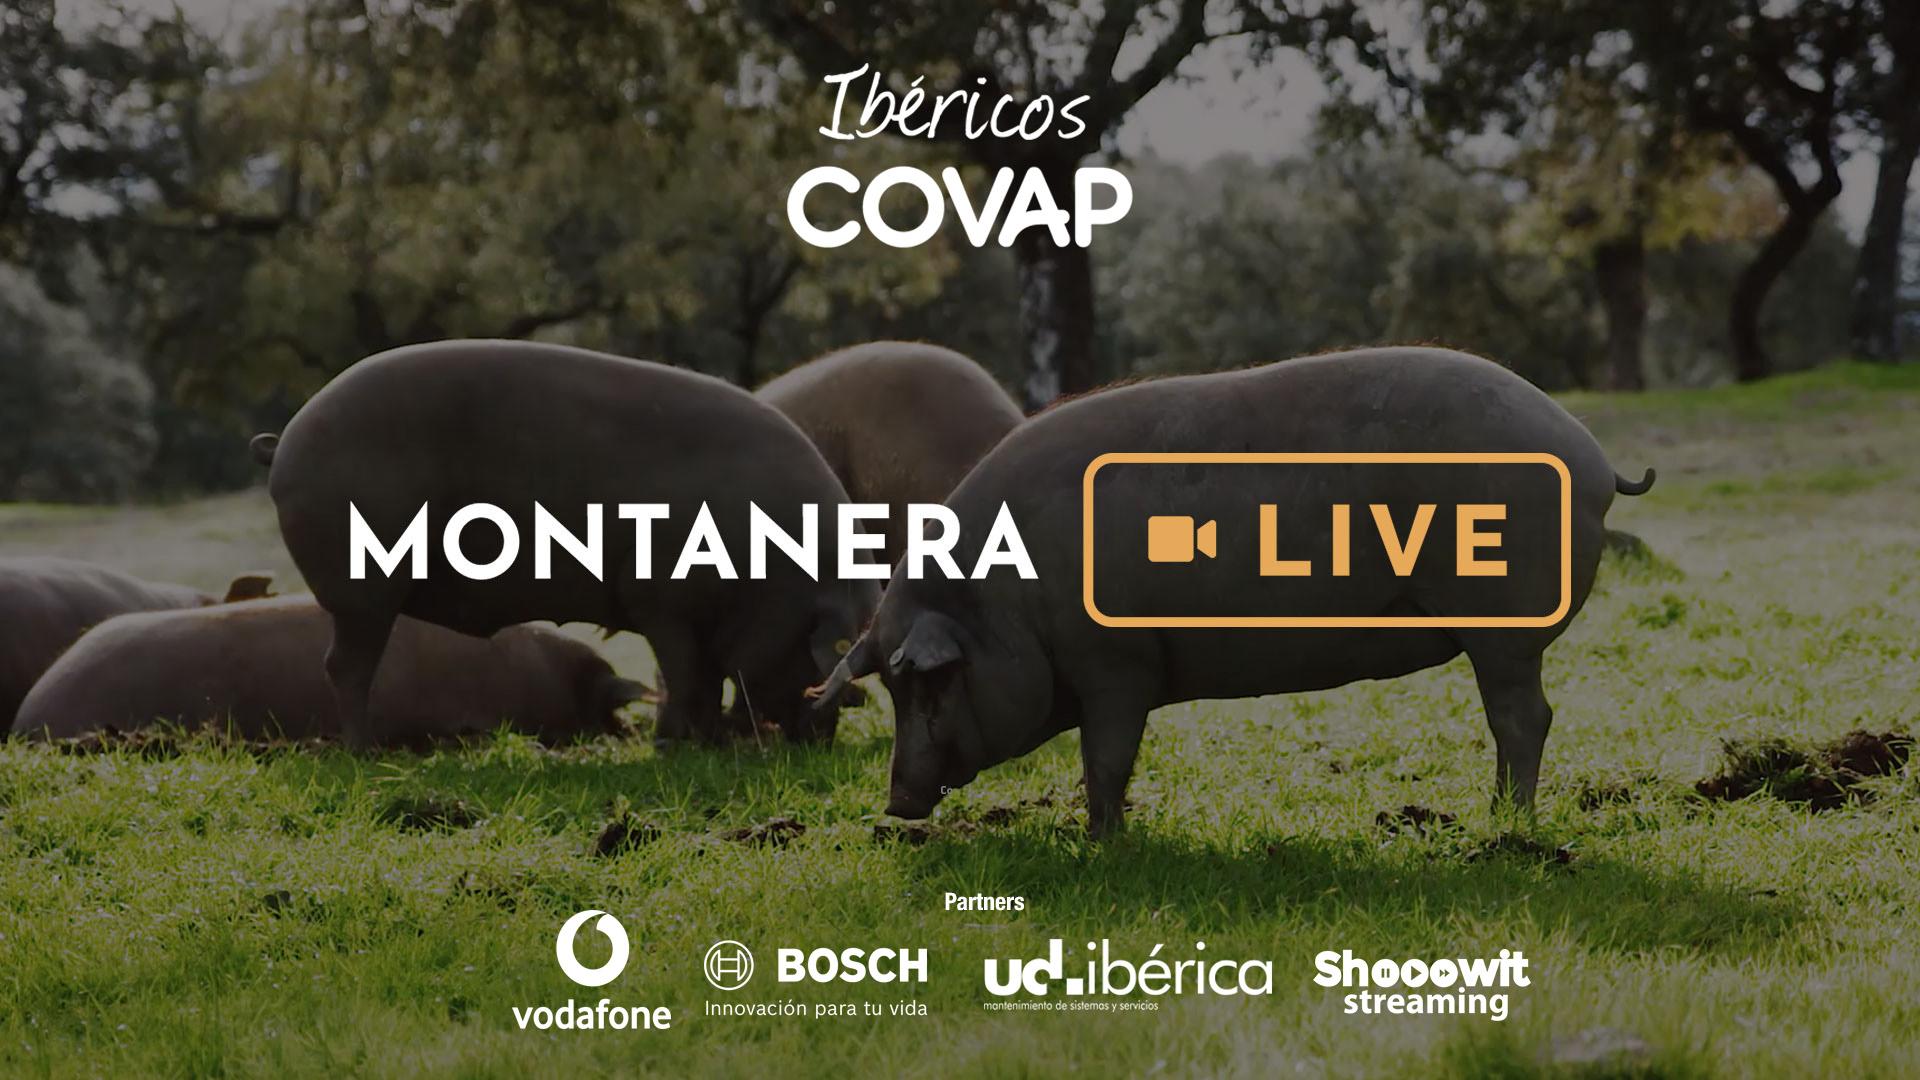 Montanera Live | Ibéricos COVAP